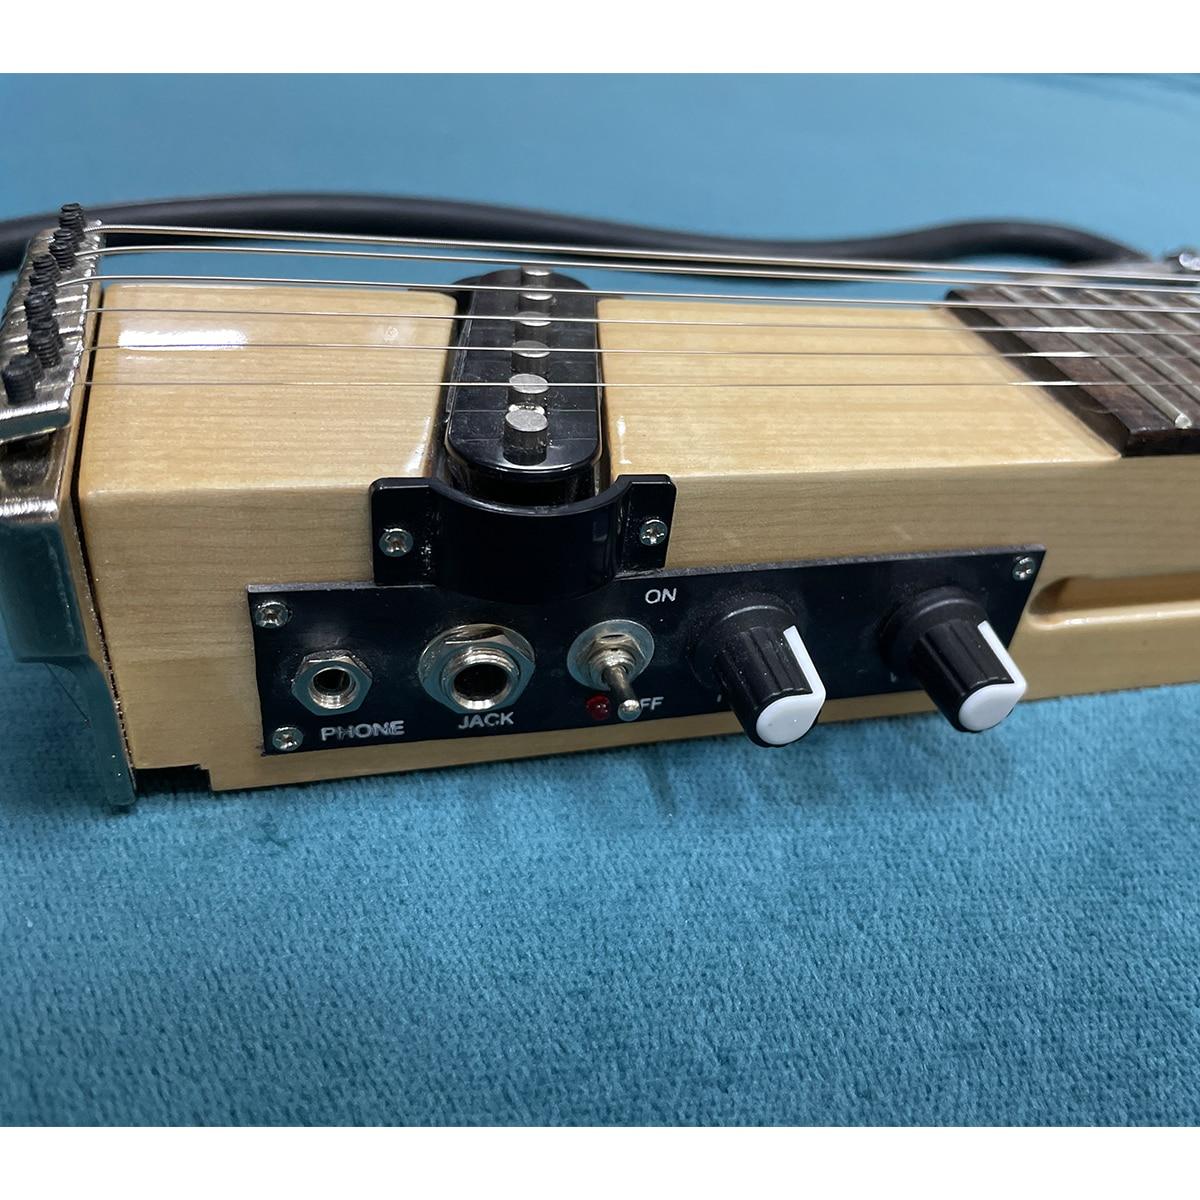 Portable Veneer Guitar Practice Neck Electric Guitar Chord Fingering Trainer Mute Guitar For Beginner Travel Guitar enlarge